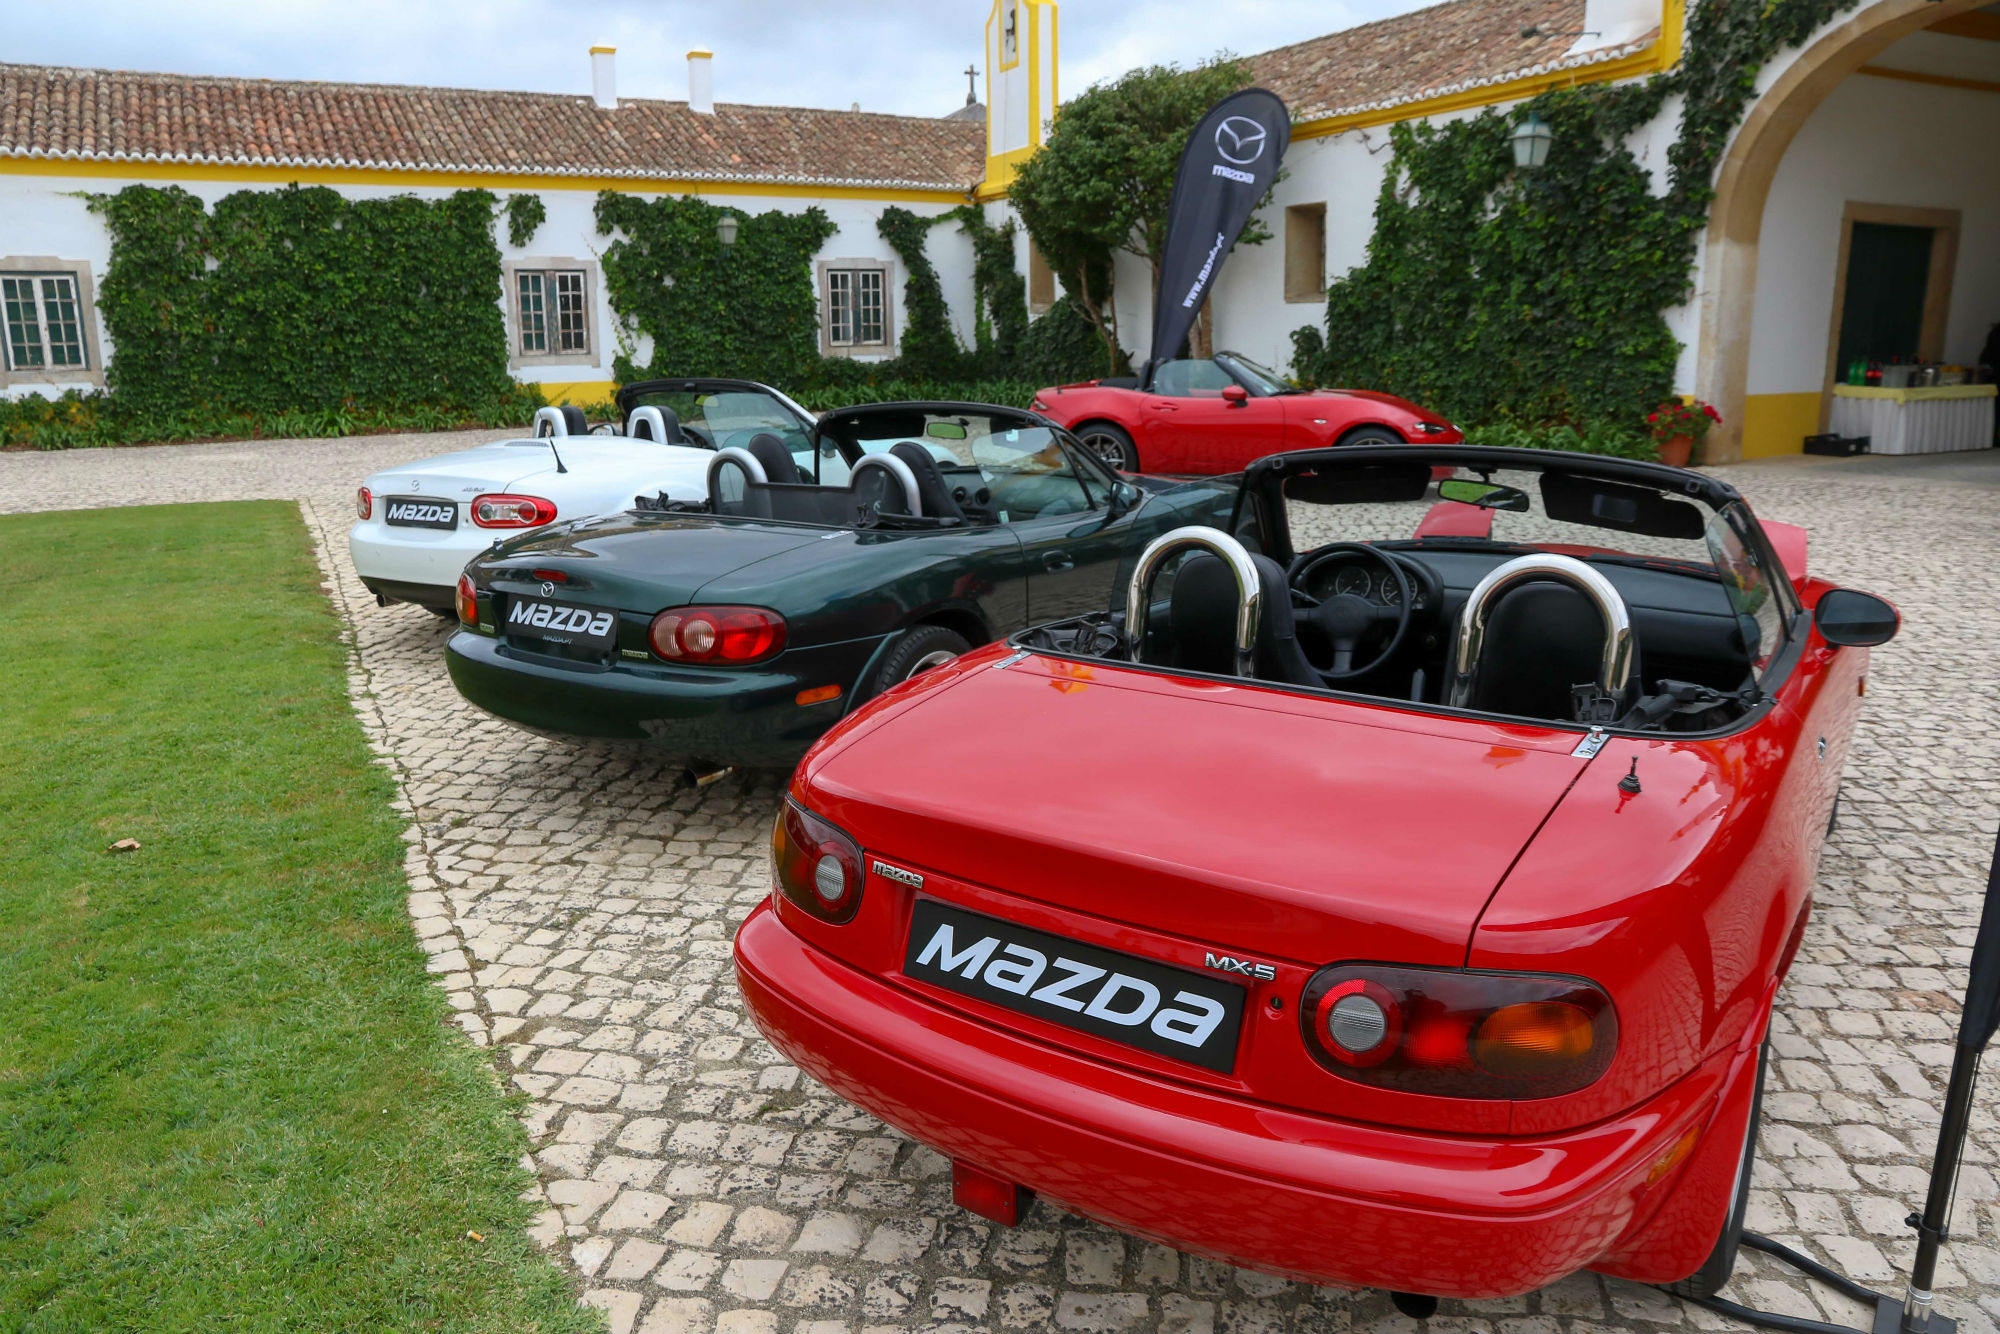 Mazda MX-5 NA, Mazda MX-5 NB, Mazda MX-5 NC, Mazda MX-5 ND